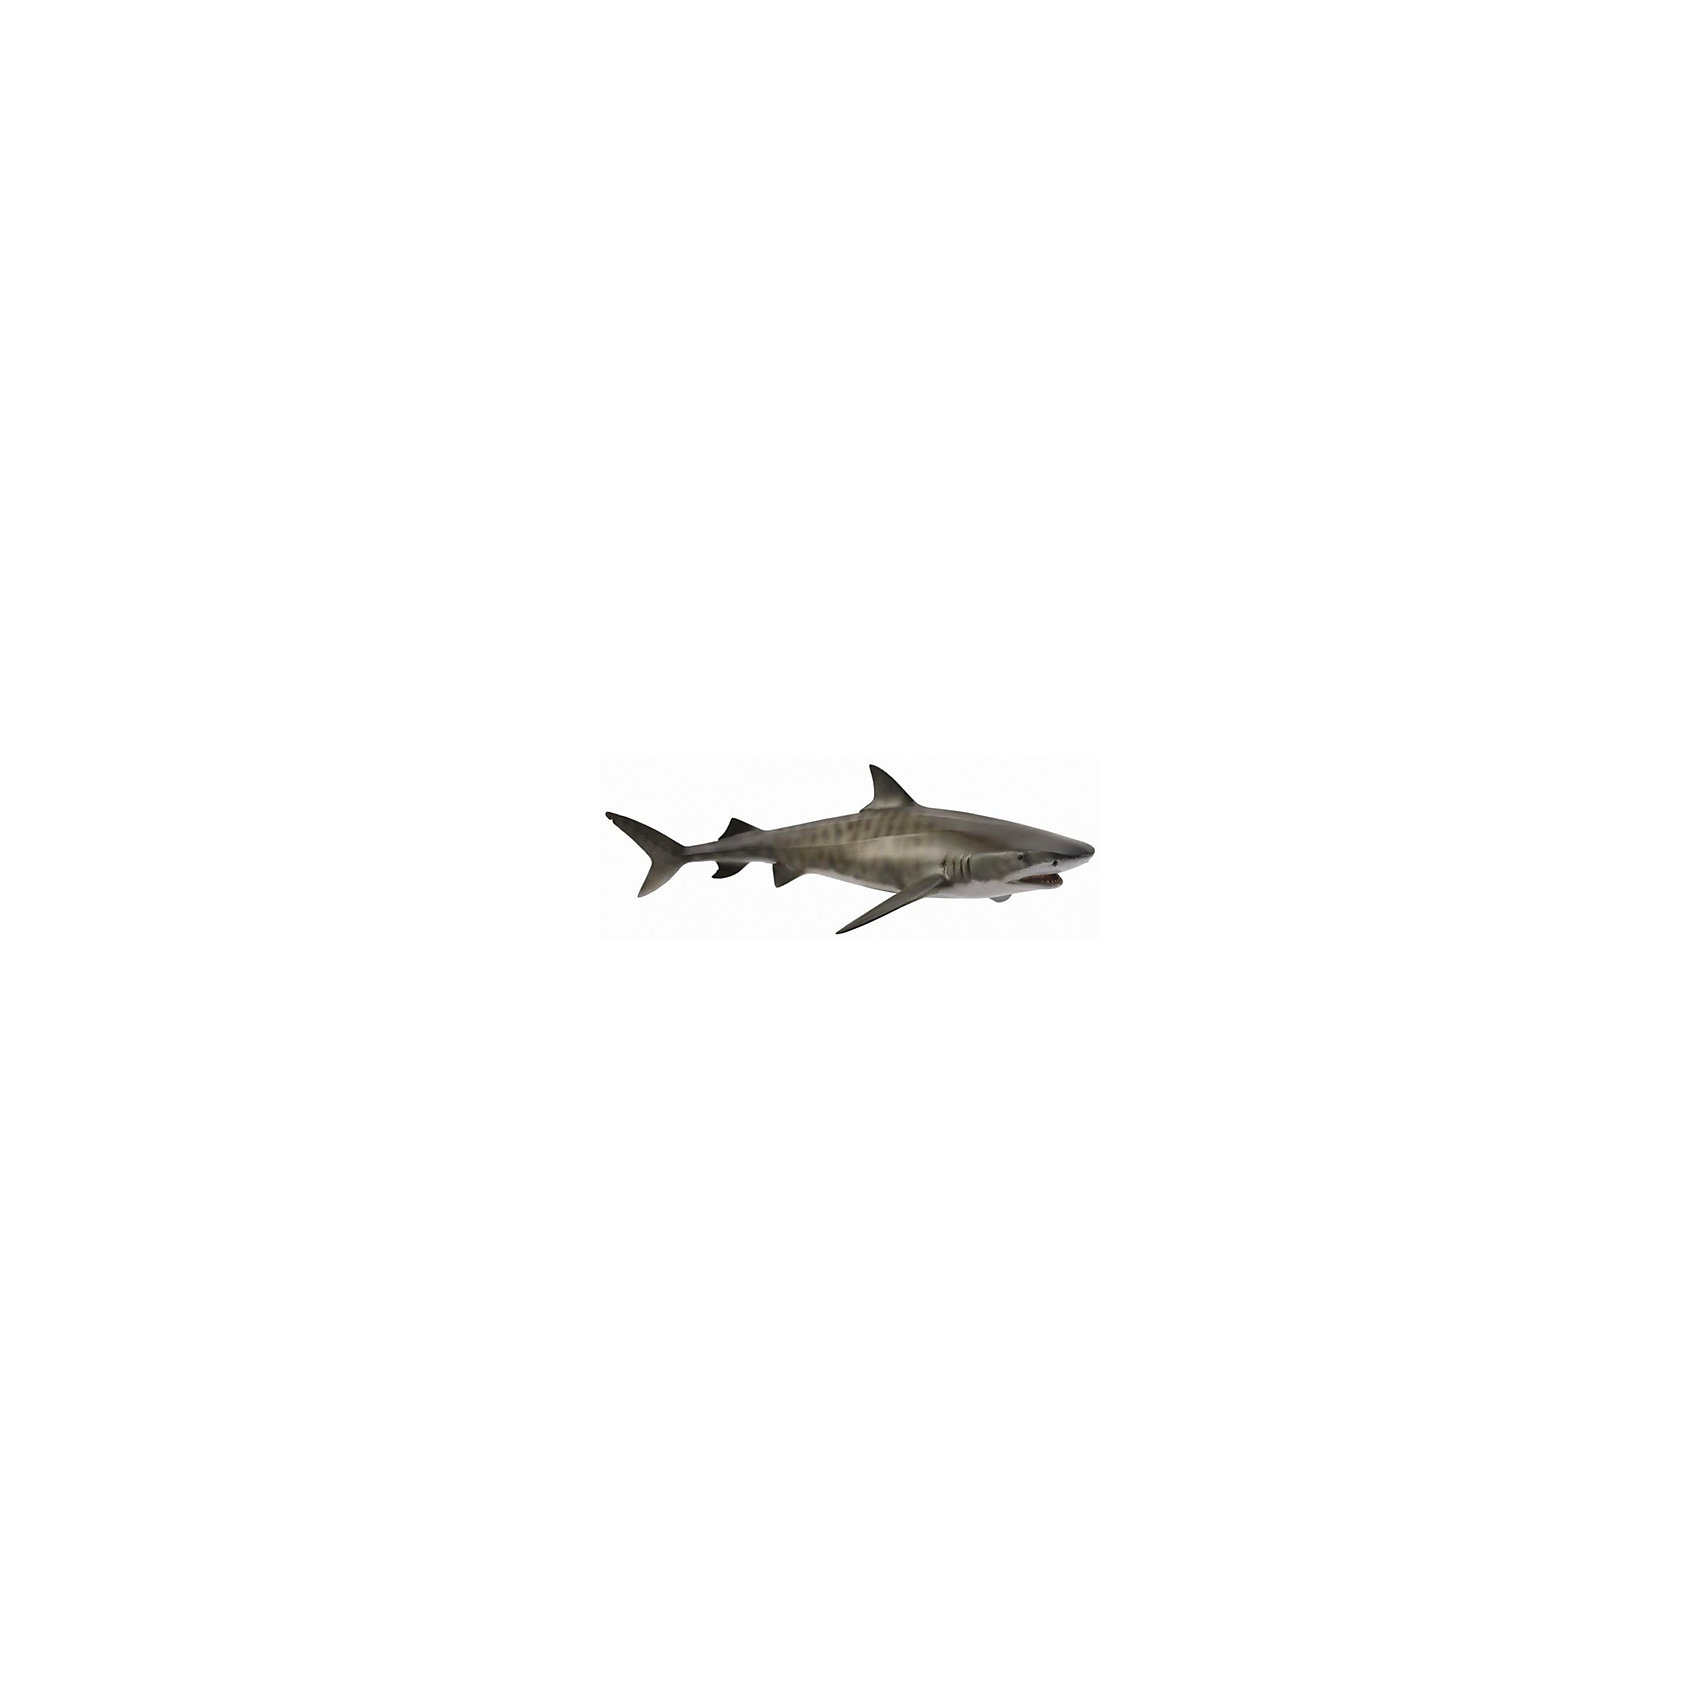 Тигровая акула, L, CollectaМир животных<br><br><br>Ширина мм: 200<br>Глубина мм: 10<br>Высота мм: 10<br>Вес г: 150<br>Возраст от месяцев: 36<br>Возраст до месяцев: 192<br>Пол: Унисекс<br>Возраст: Детский<br>SKU: 5534507